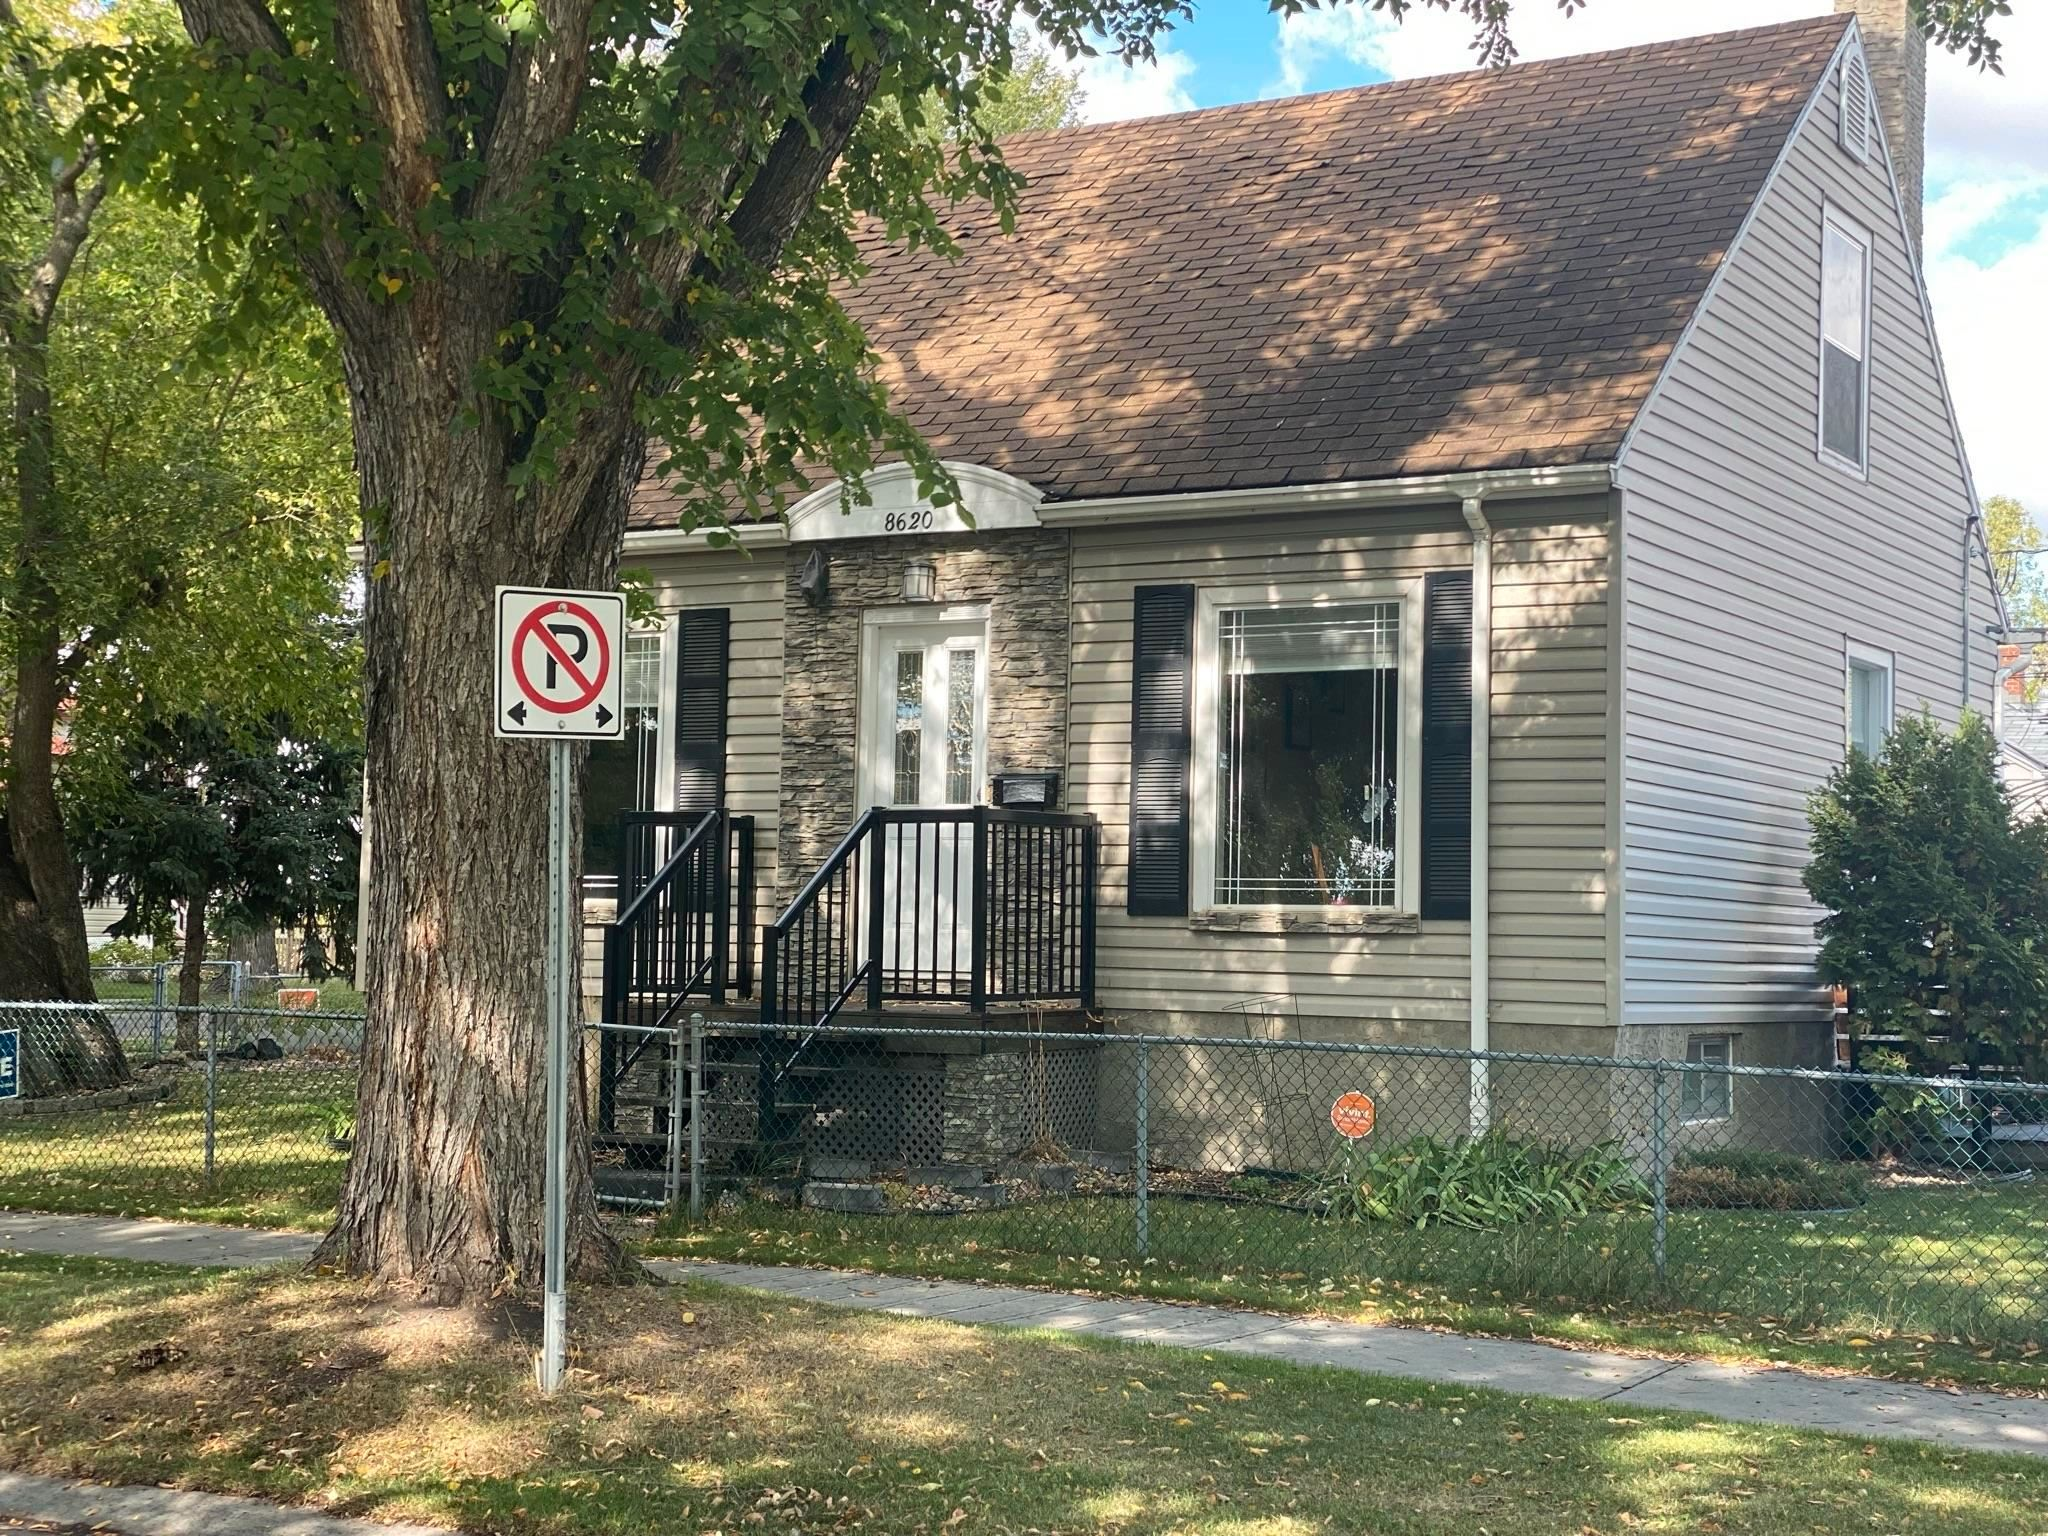 Main Photo: 8620 116 Avenue in Edmonton: Zone 05 House for sale : MLS®# E4263365